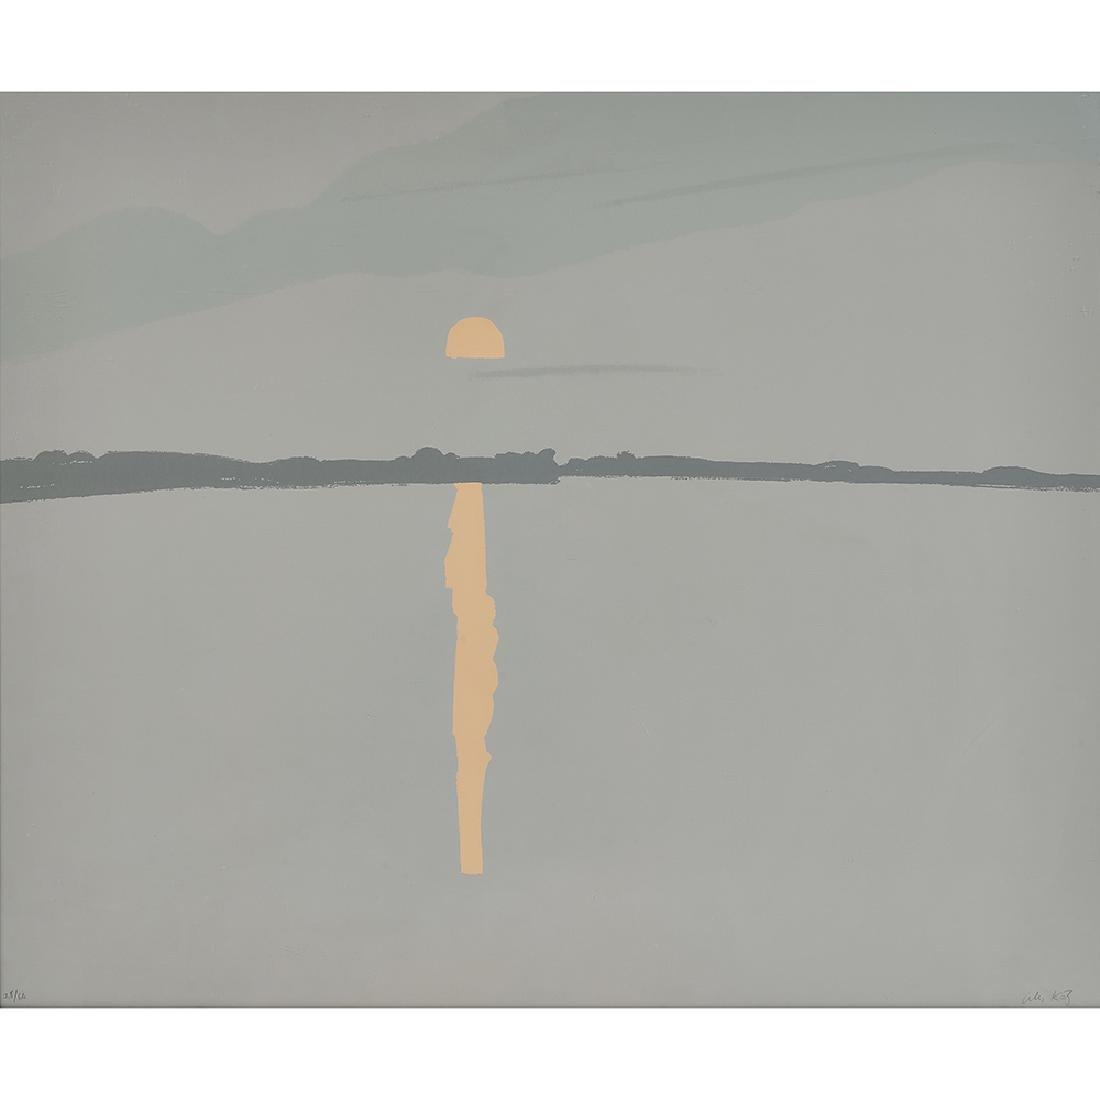 Alex Katz, Sunset, Lake Wesserumett, 1972